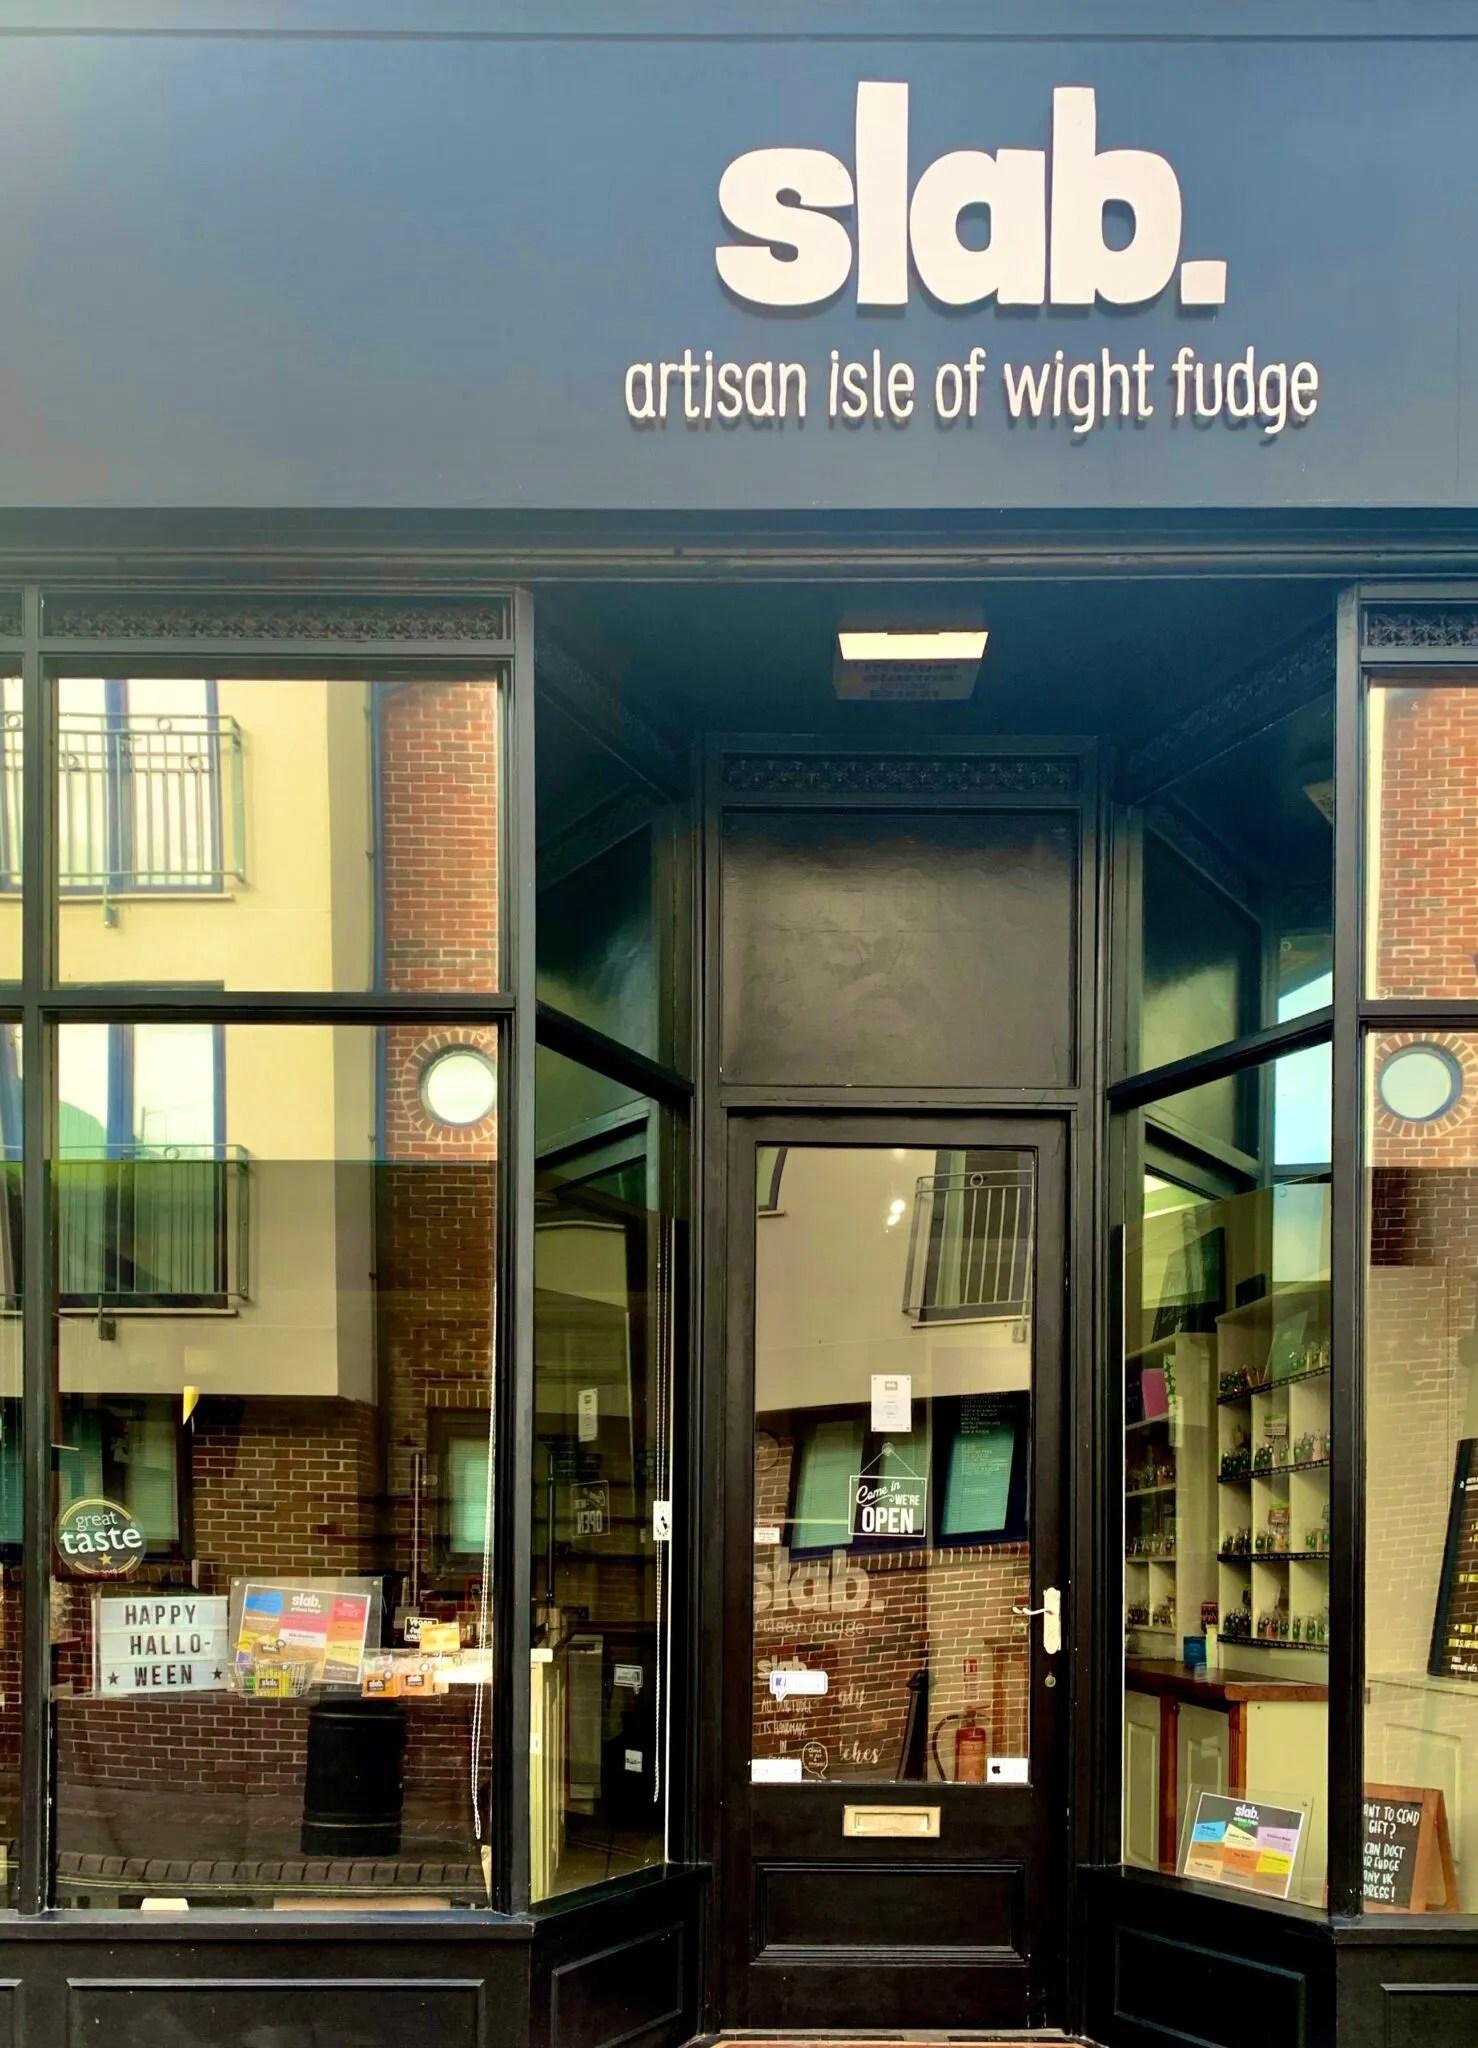 Slab Artisan Fudge - Shop Front Image